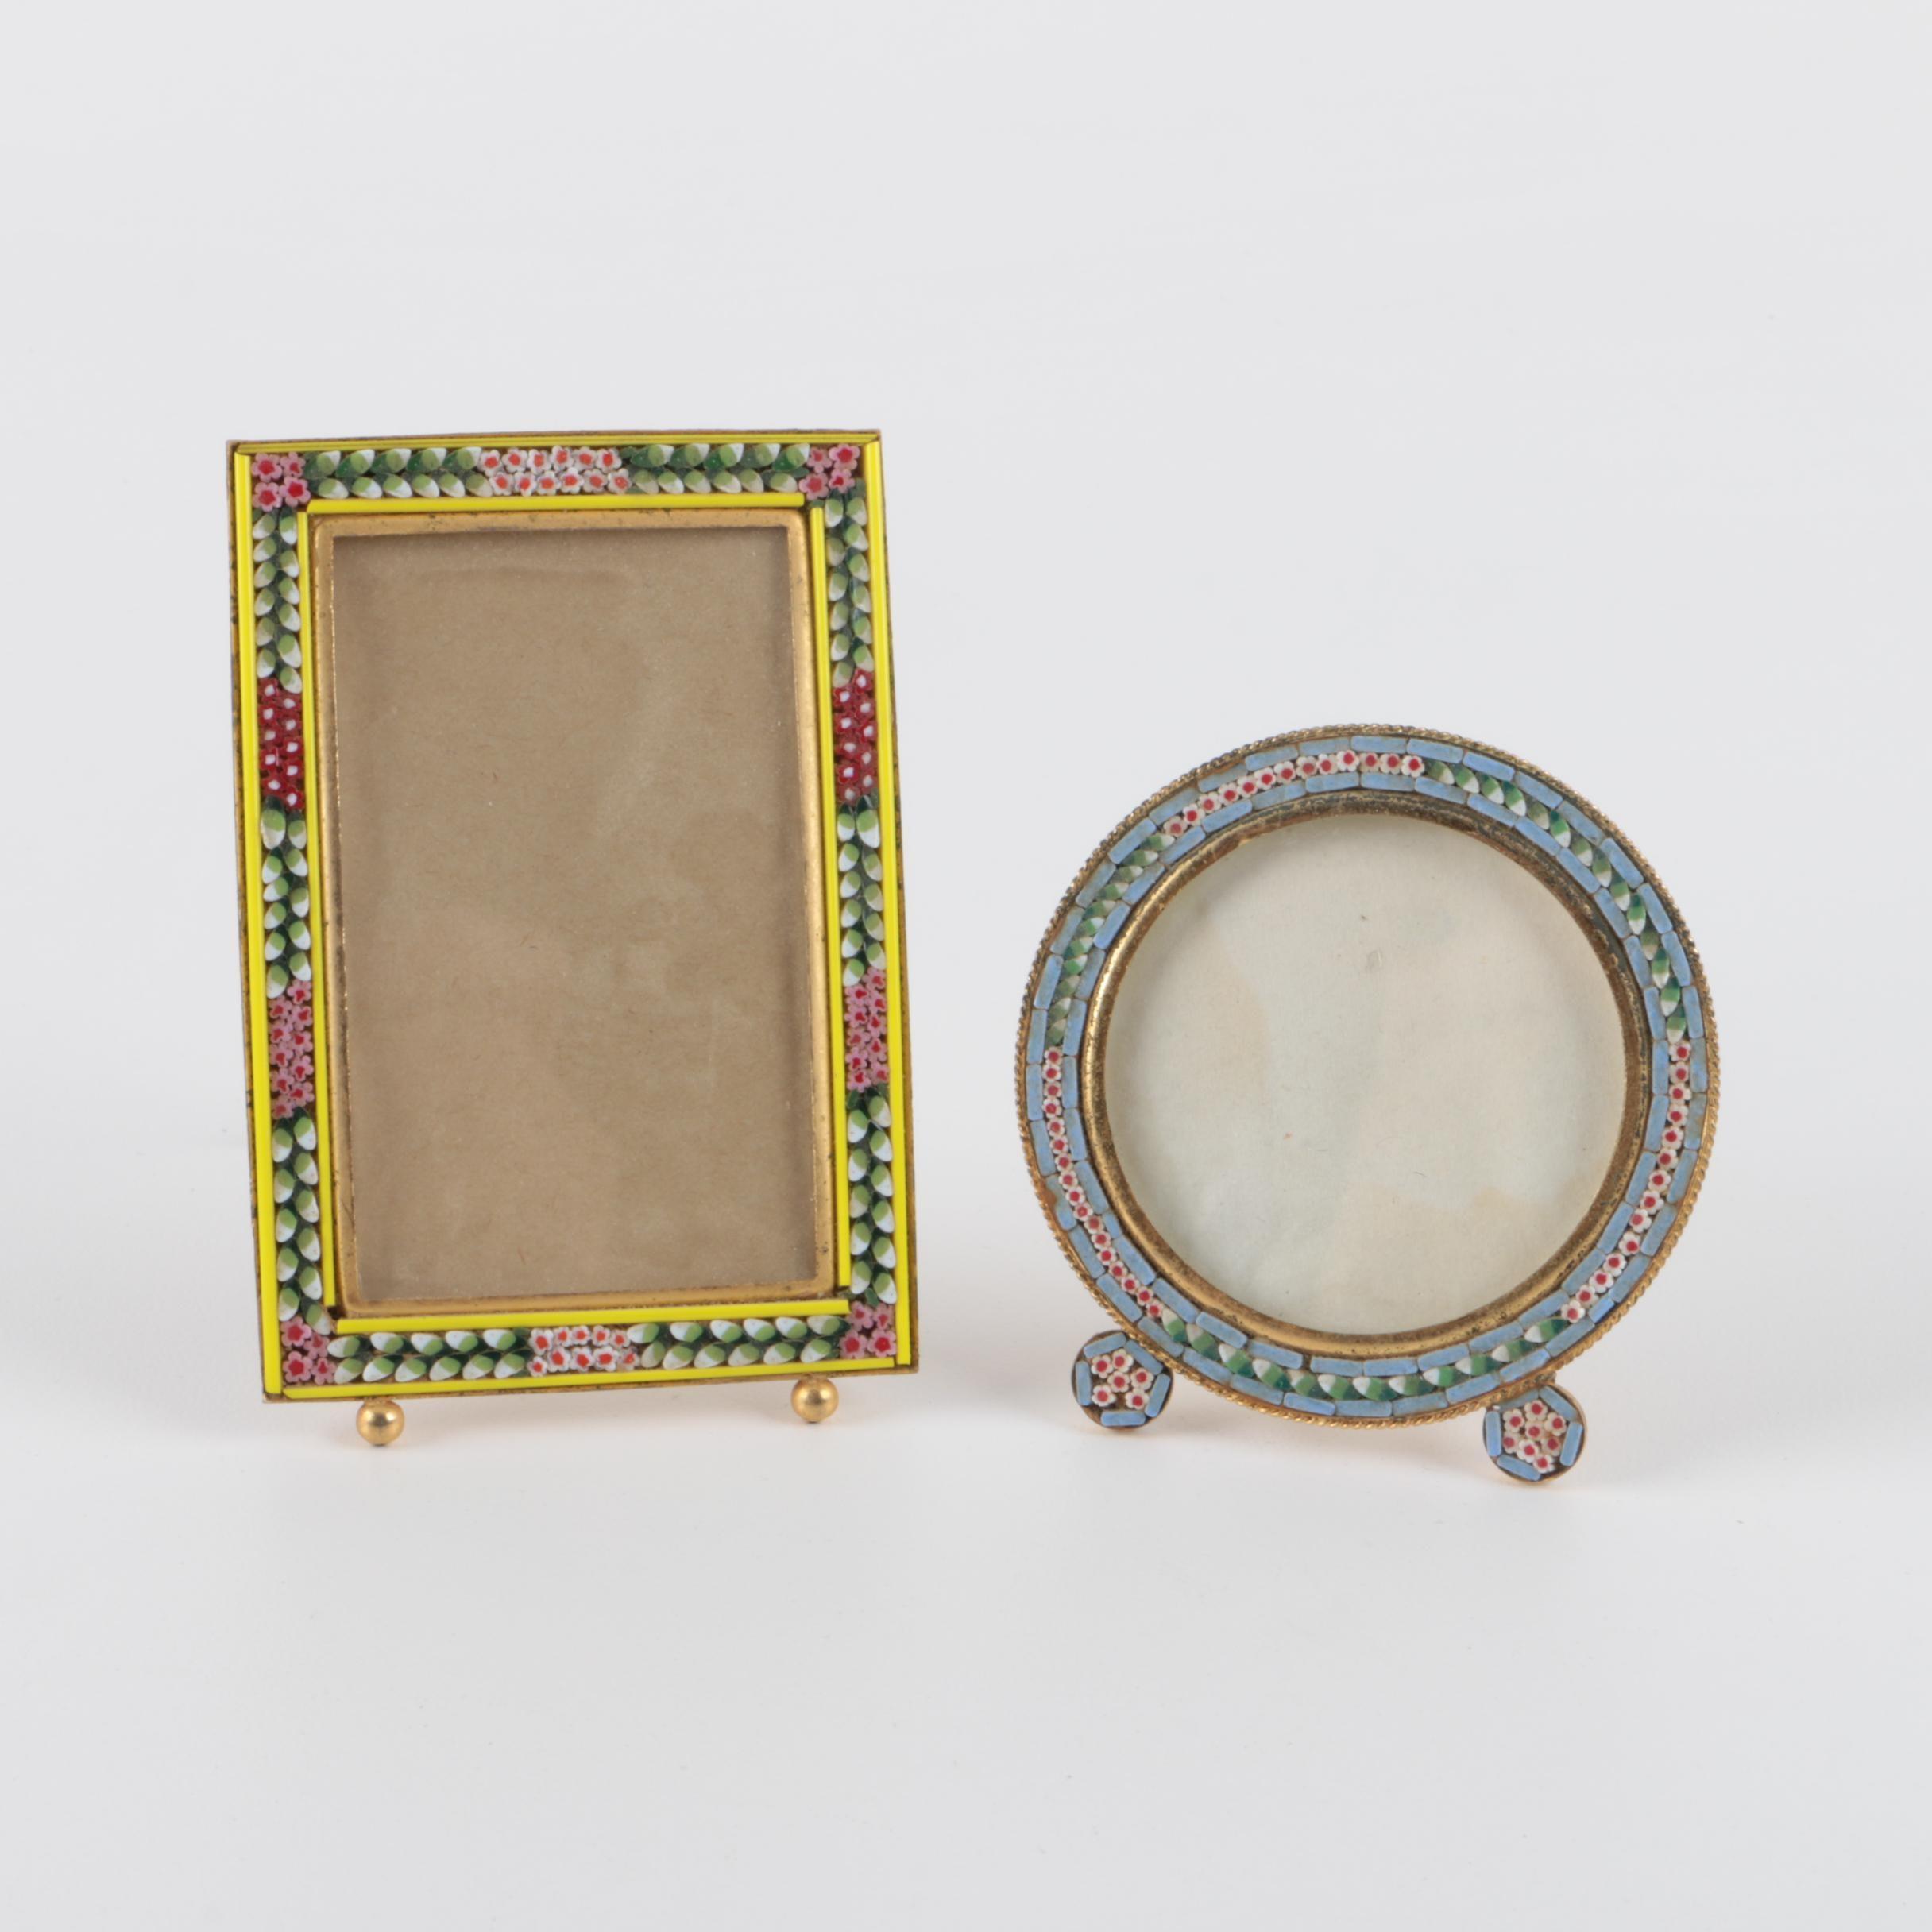 Pair of Italian Micro-Mosaic Miniature Picture Frames